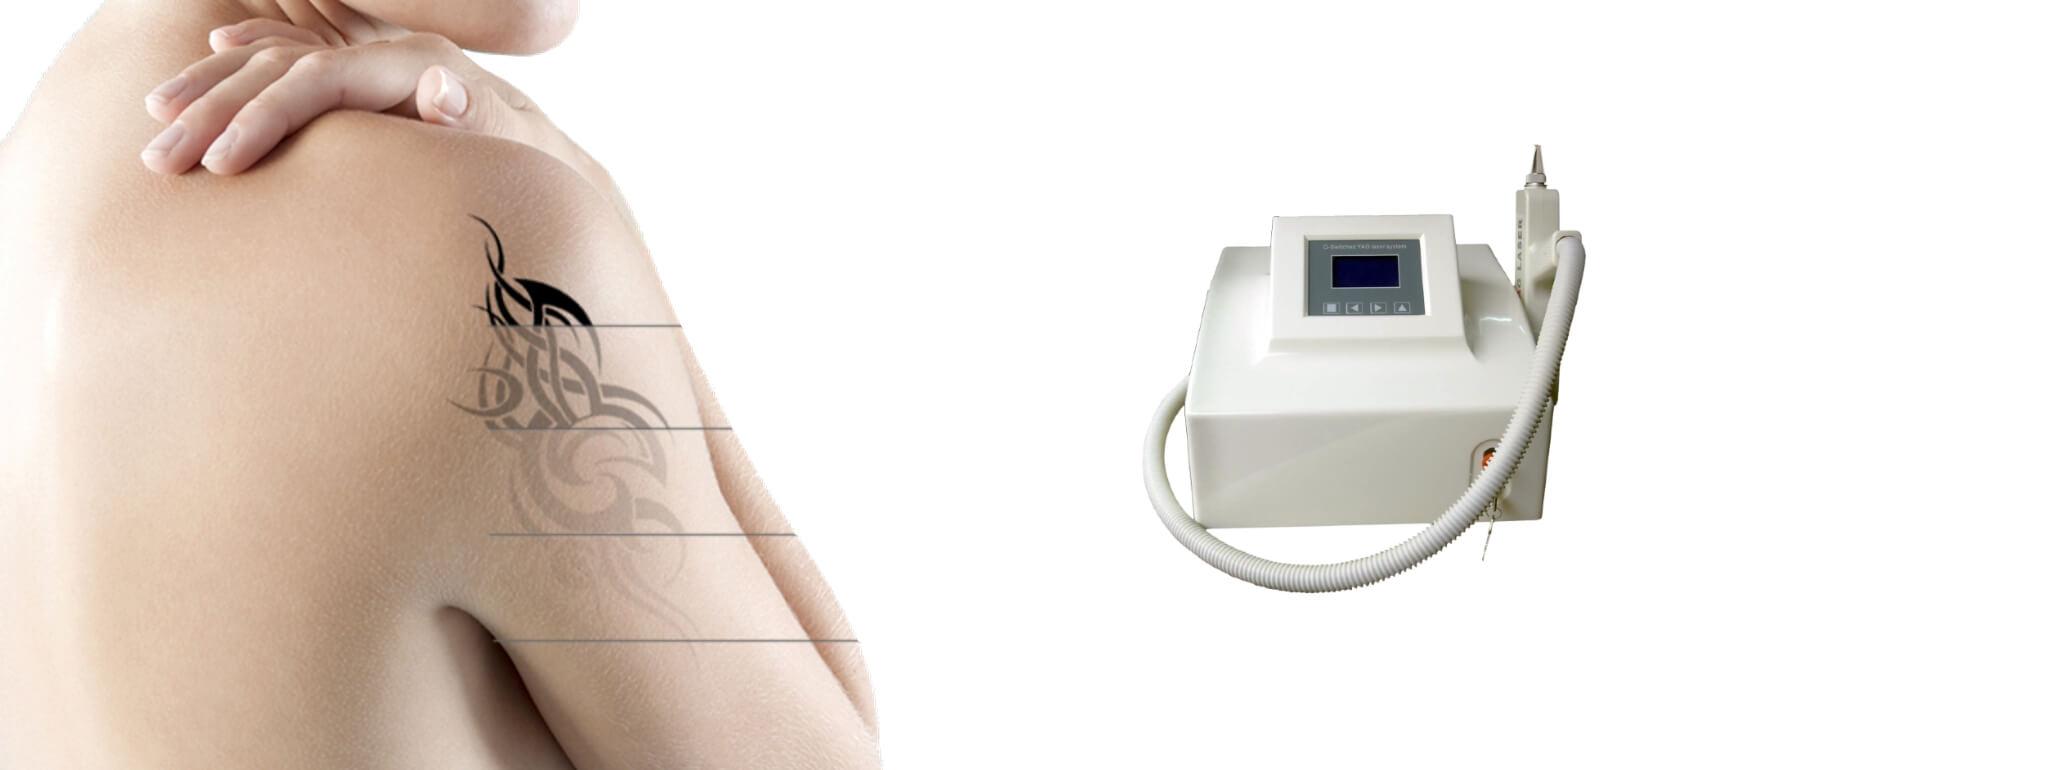 Laser Emay Q-Switch - Minas Laser Locações - Lavras MG